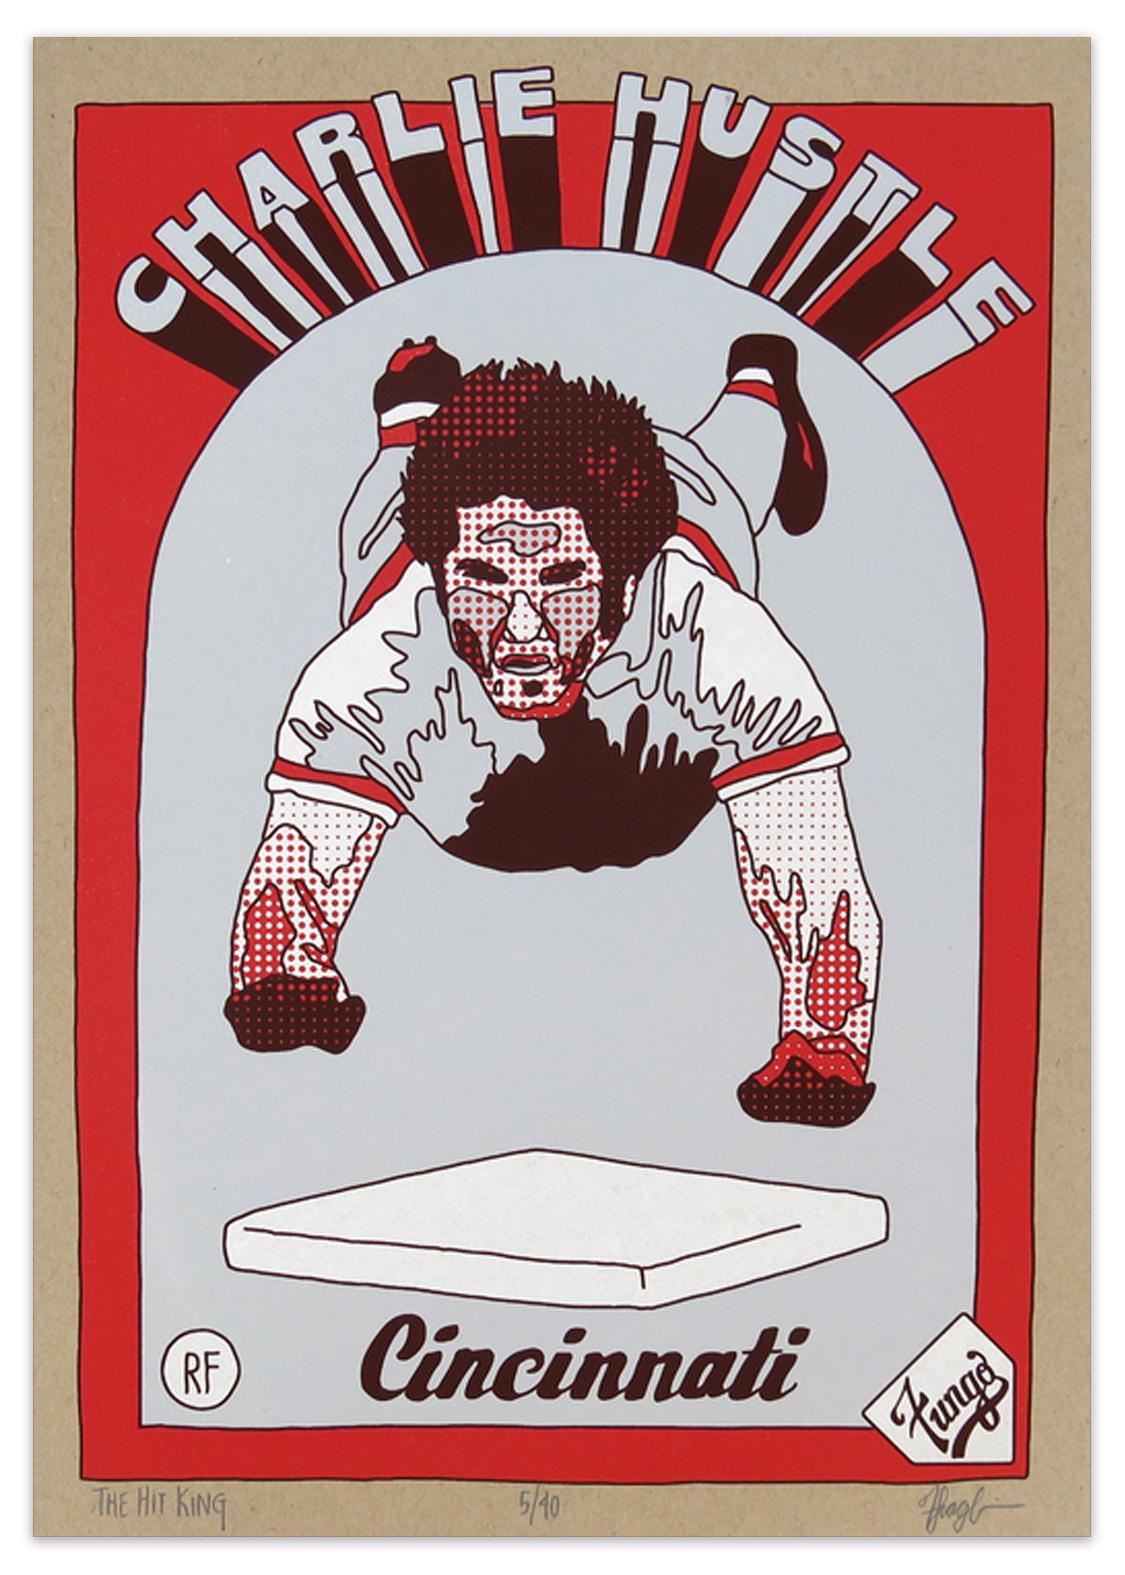 The Hit King: 1985 Charlie Hustle Screenprint